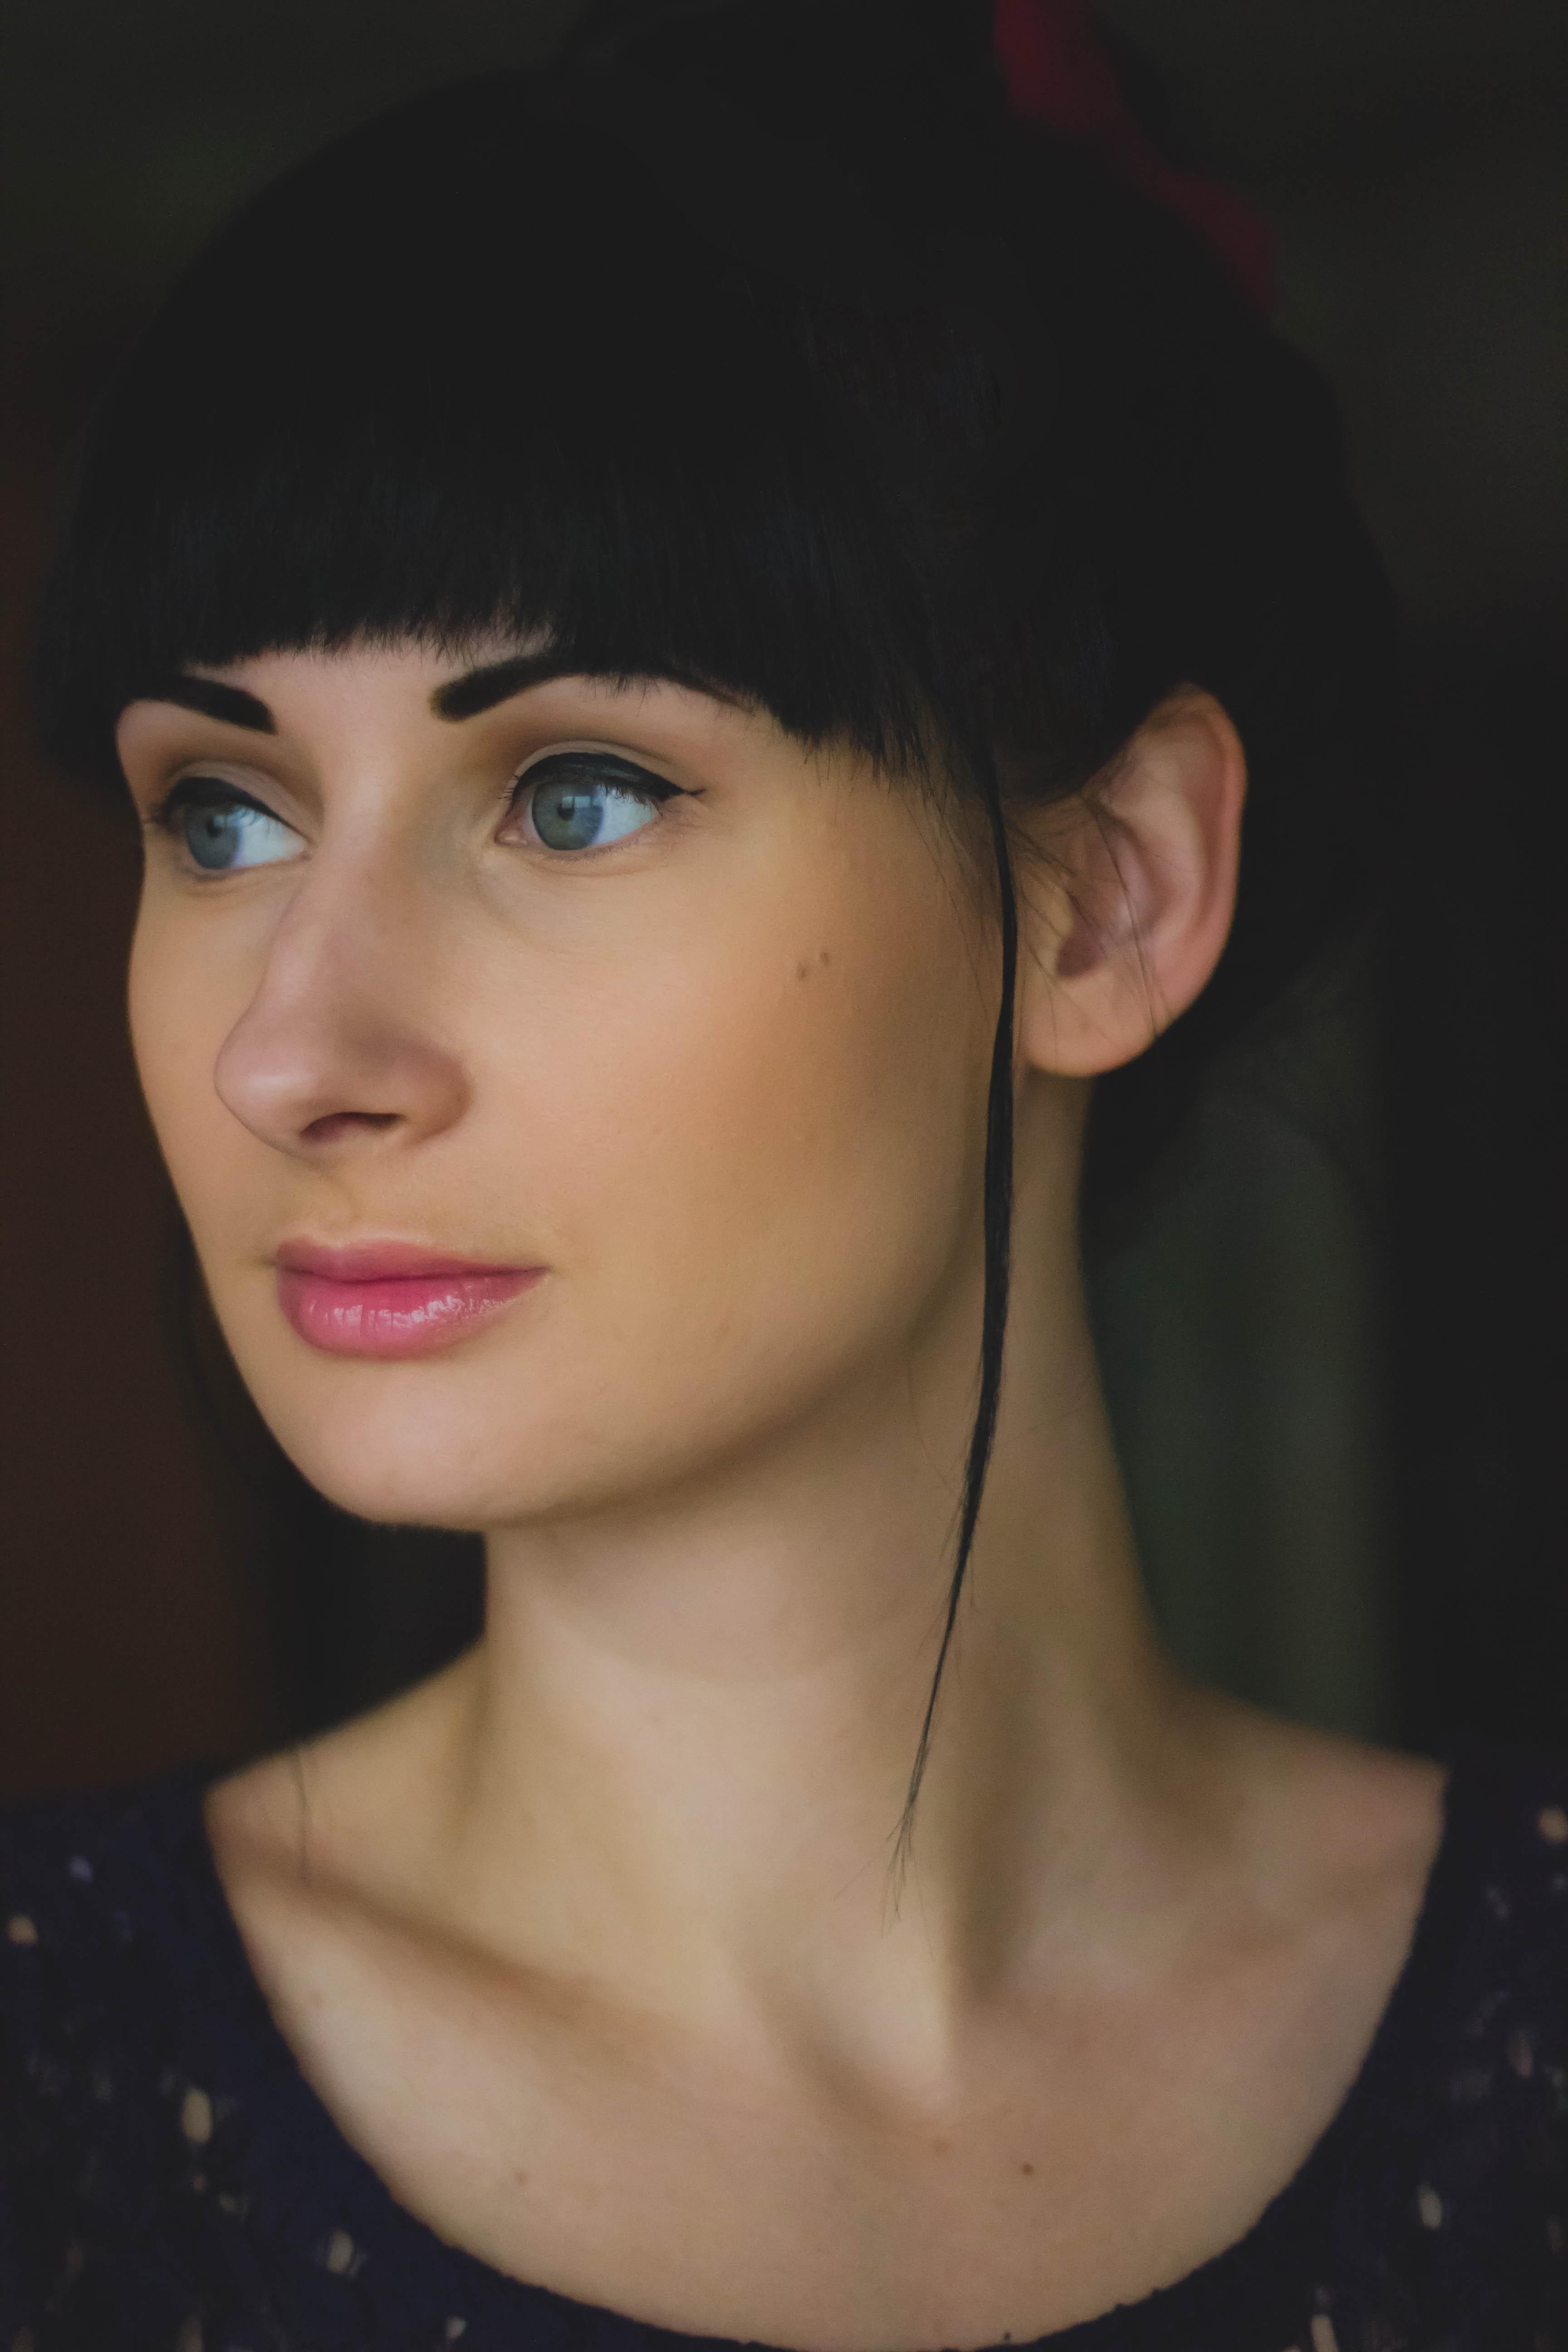 Woman Wearing Black Scoop Neck Shirt, Adult, Lips, Skin, Pretty, HQ Photo